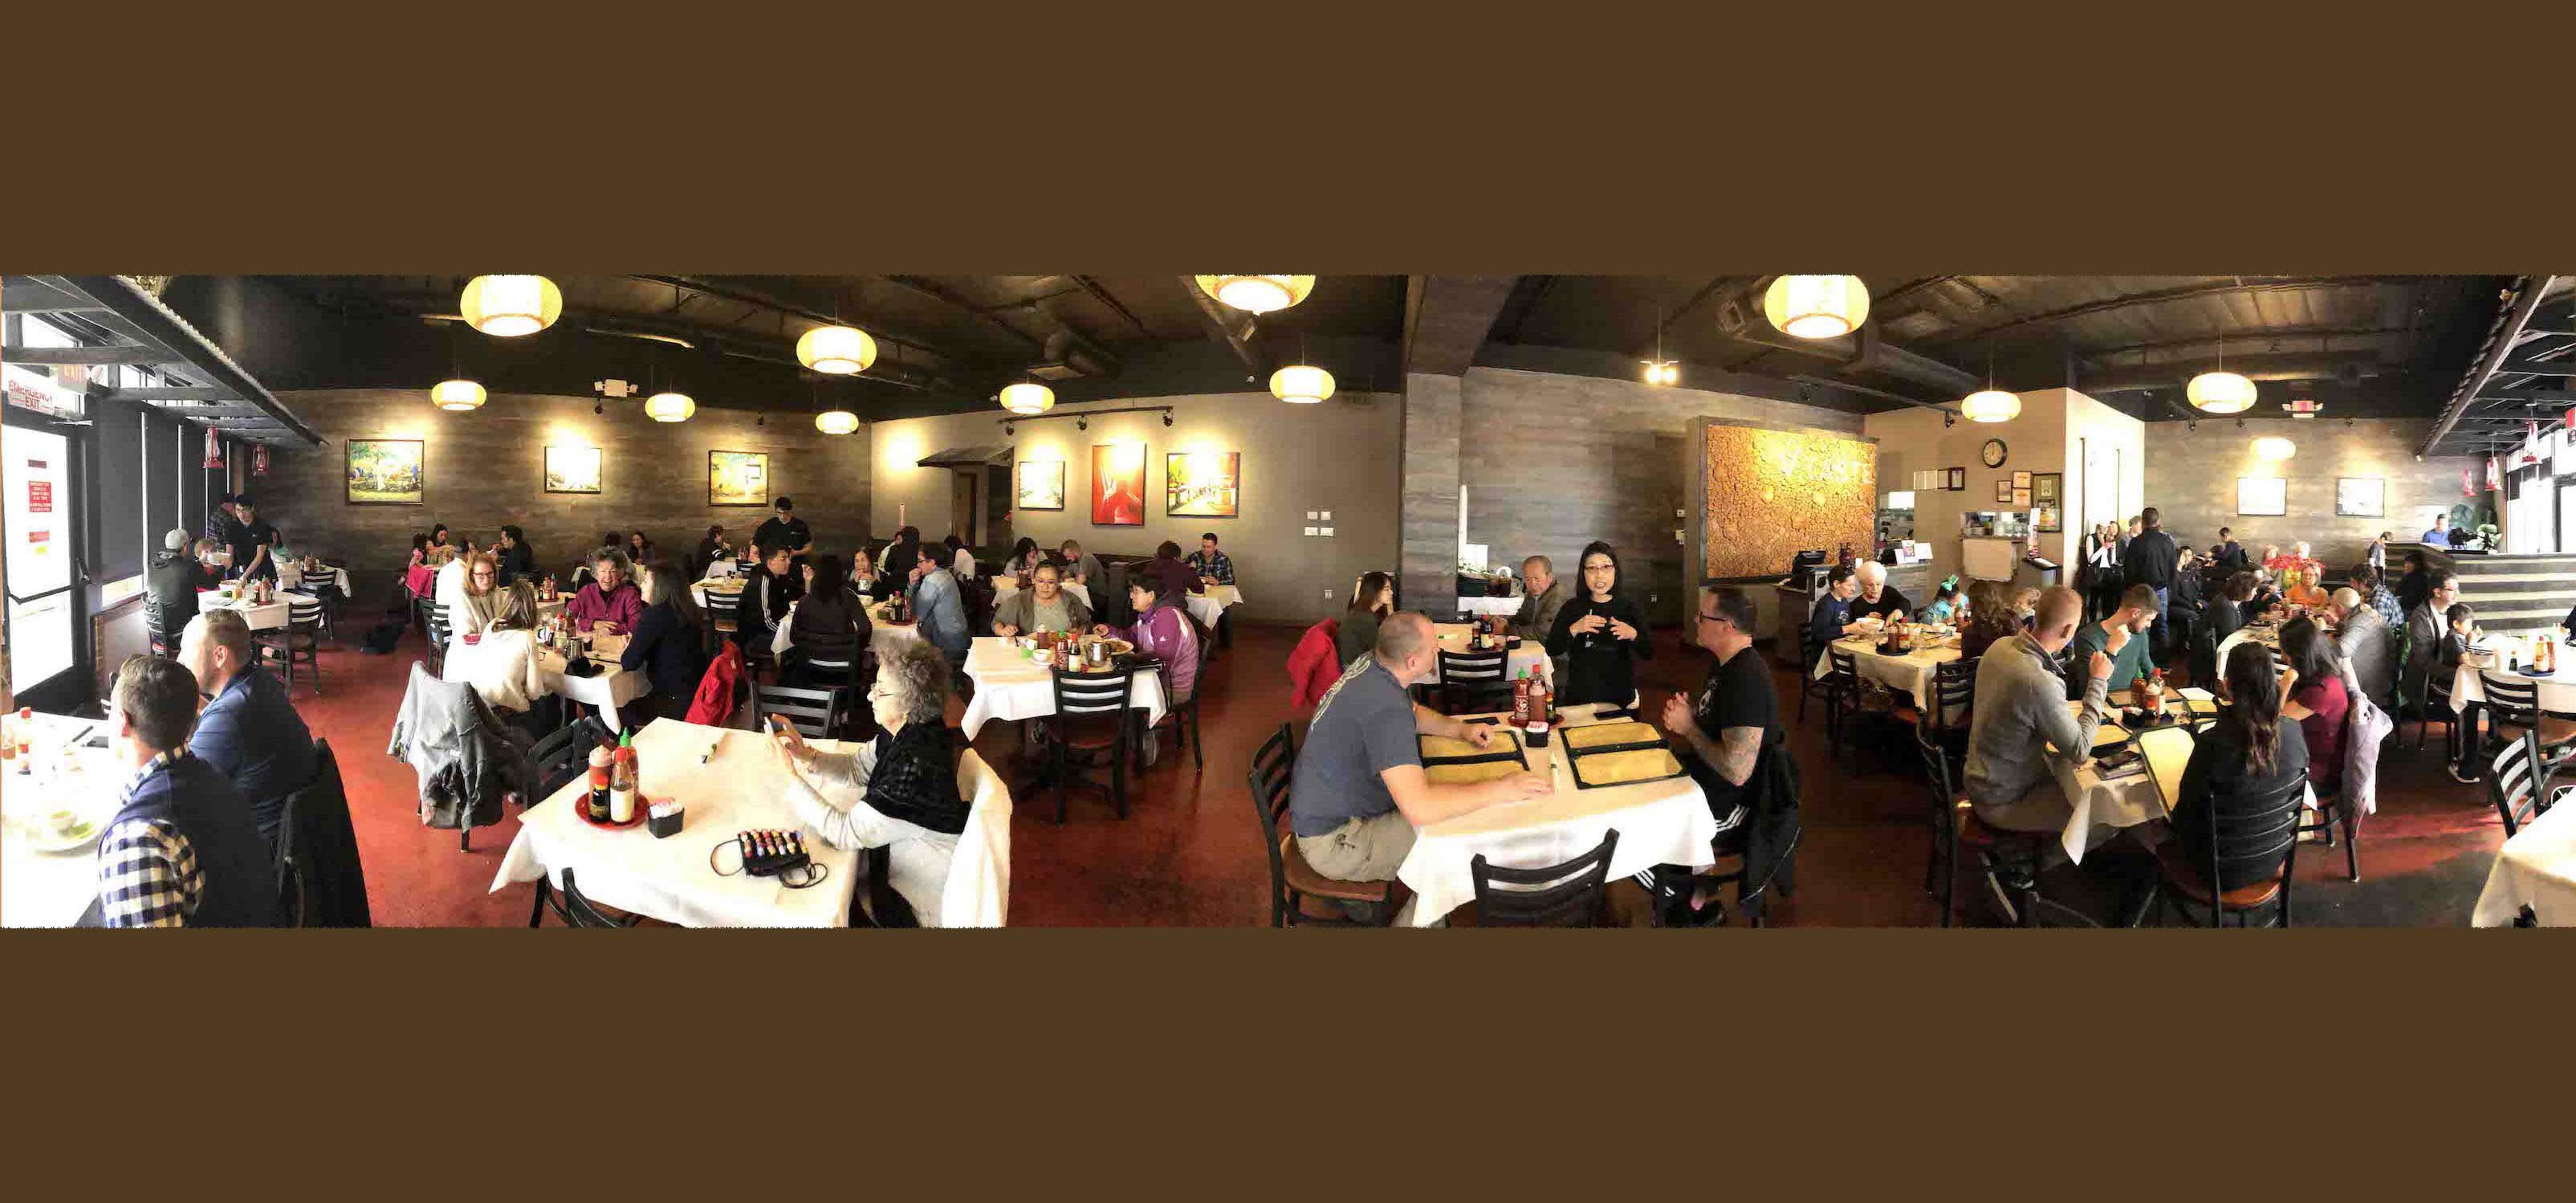 Viet Taste Dining Room Pano